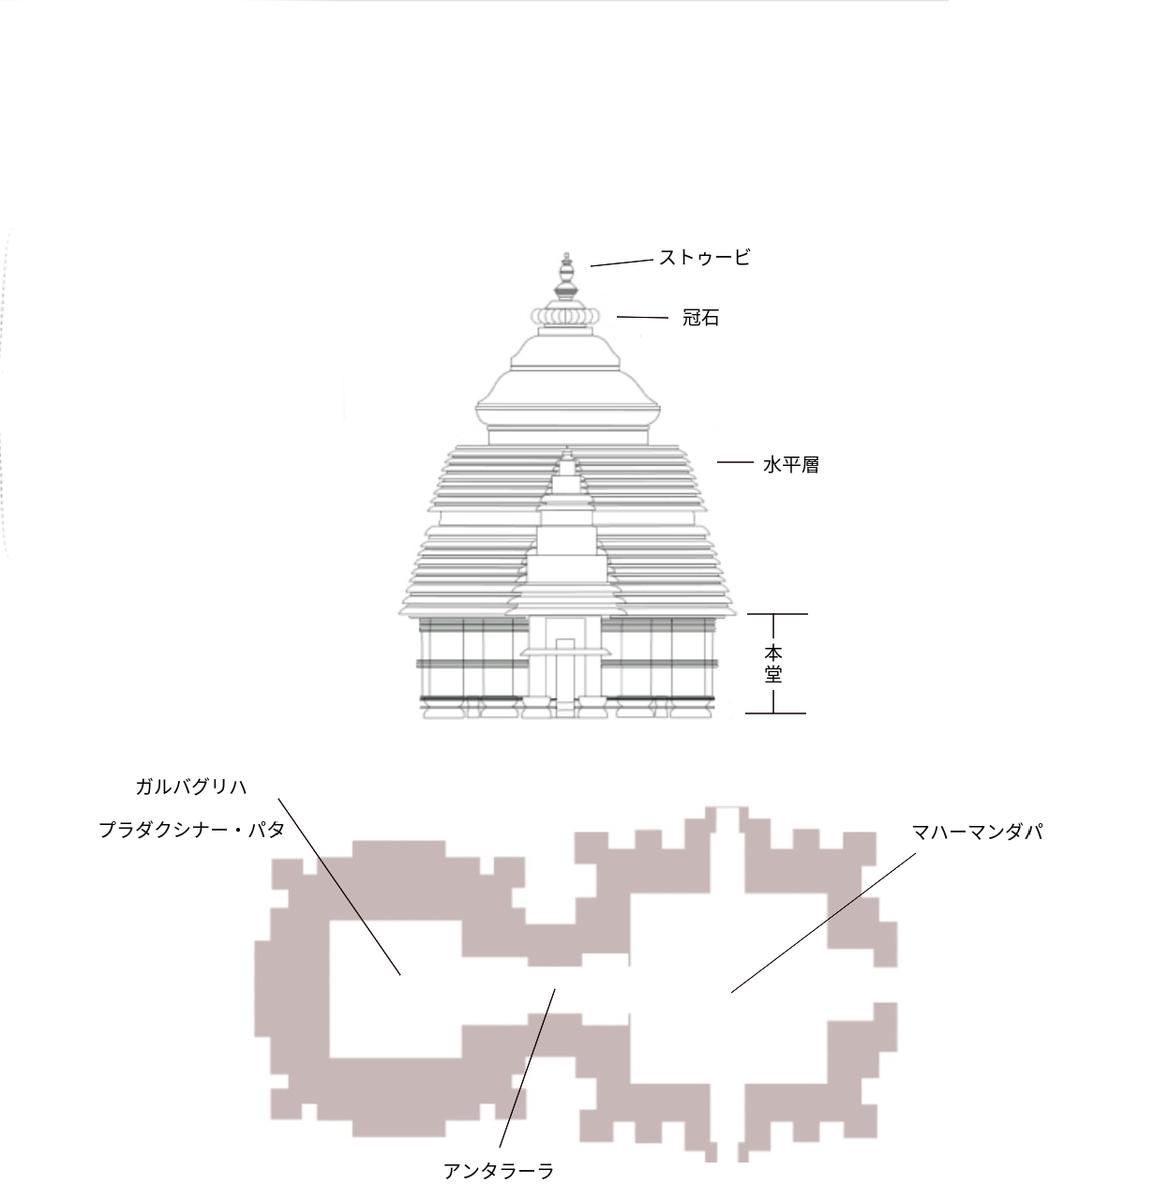 f:id:YoFu:20200903030335j:plain